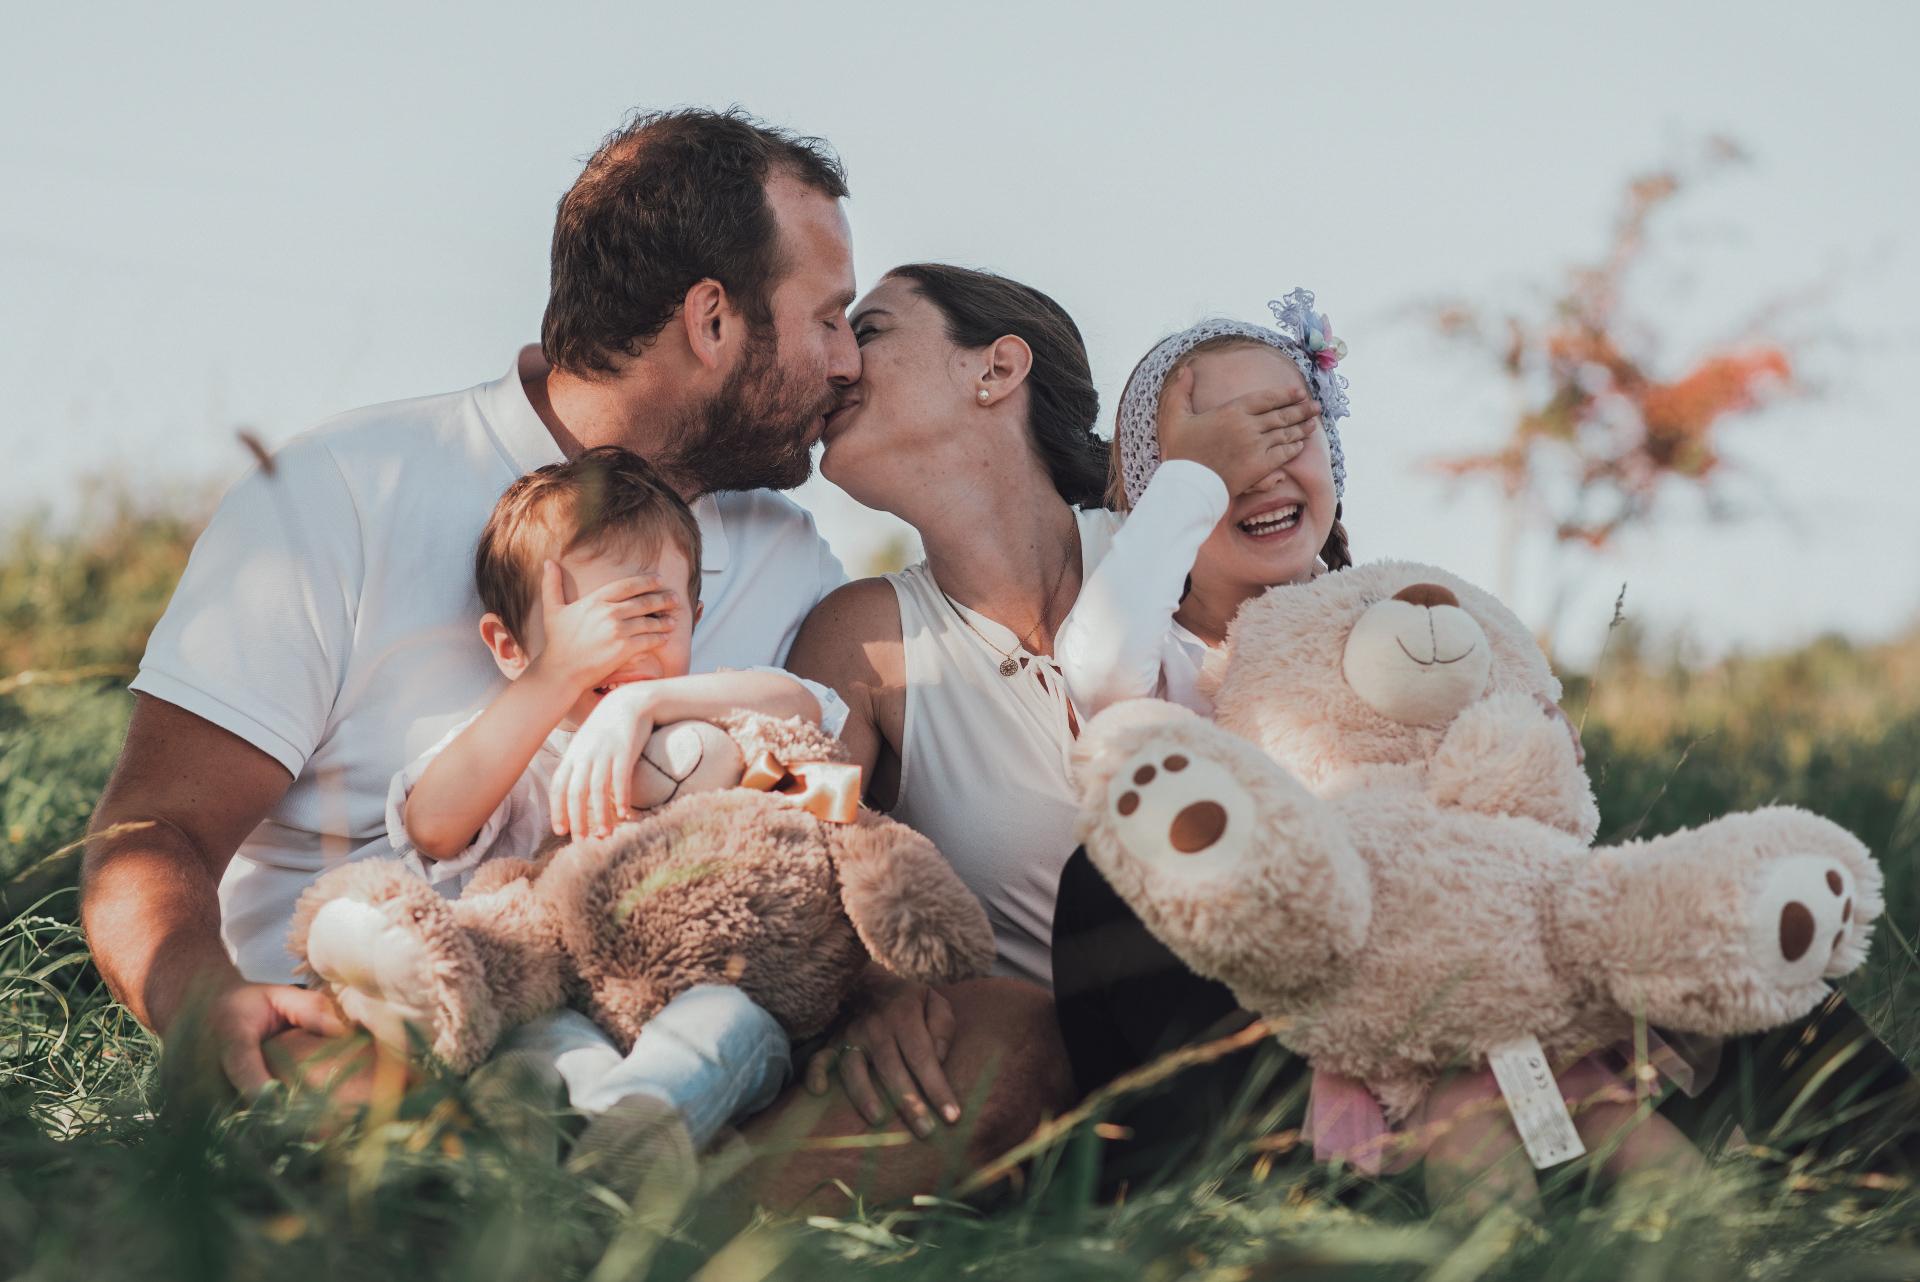 Familienfotoshooting_Kleer_Okt20_klein_51-1